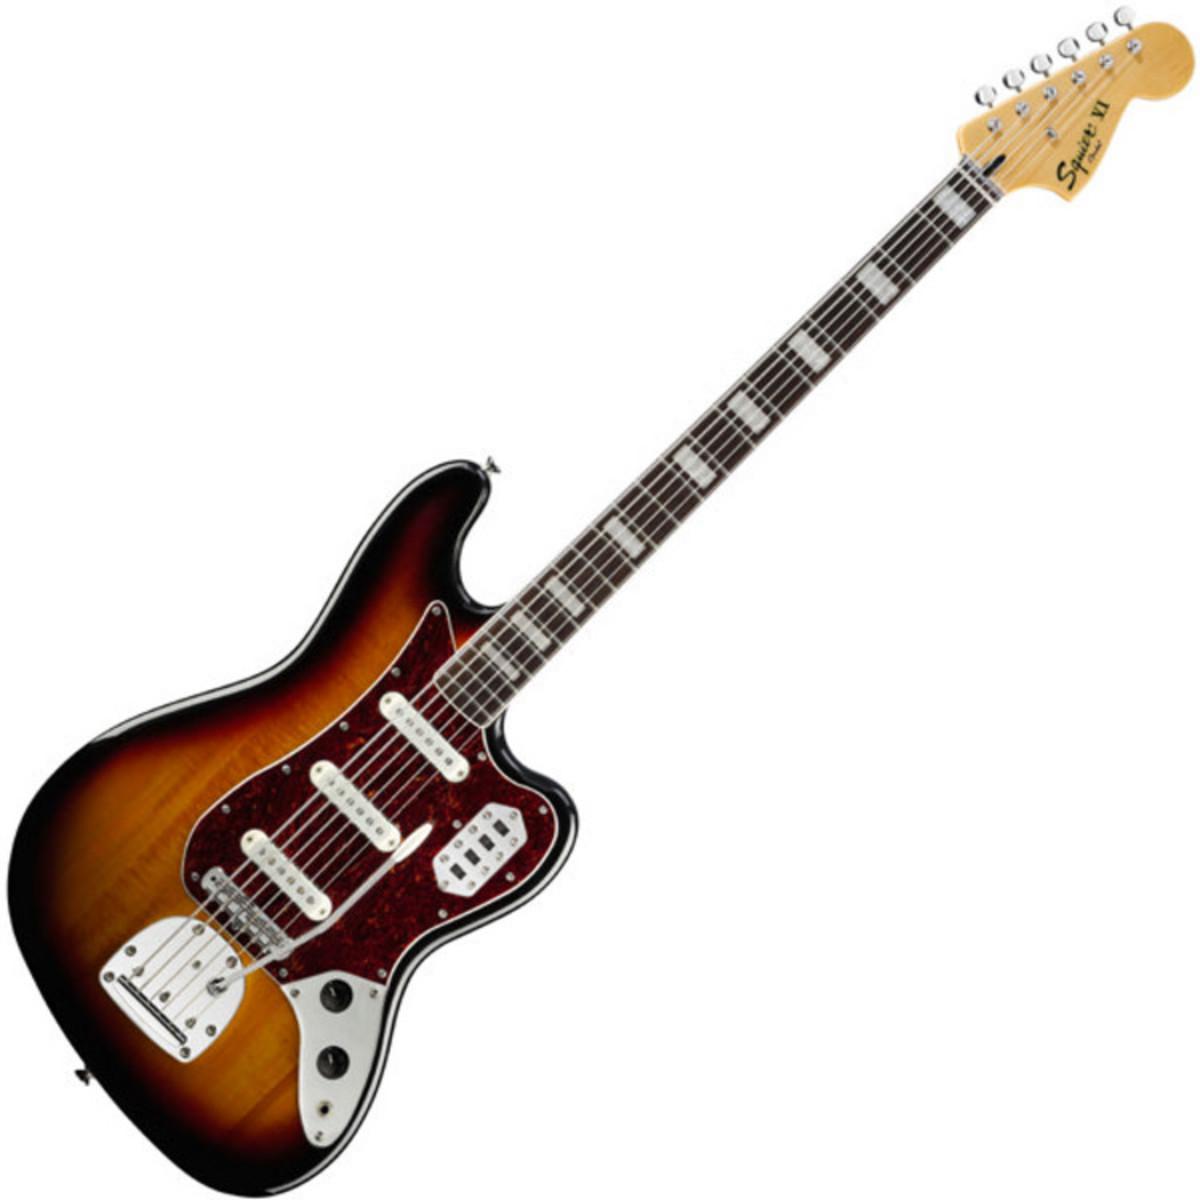 Fender Bajo Squier Vintage Modified Jazz Bass -